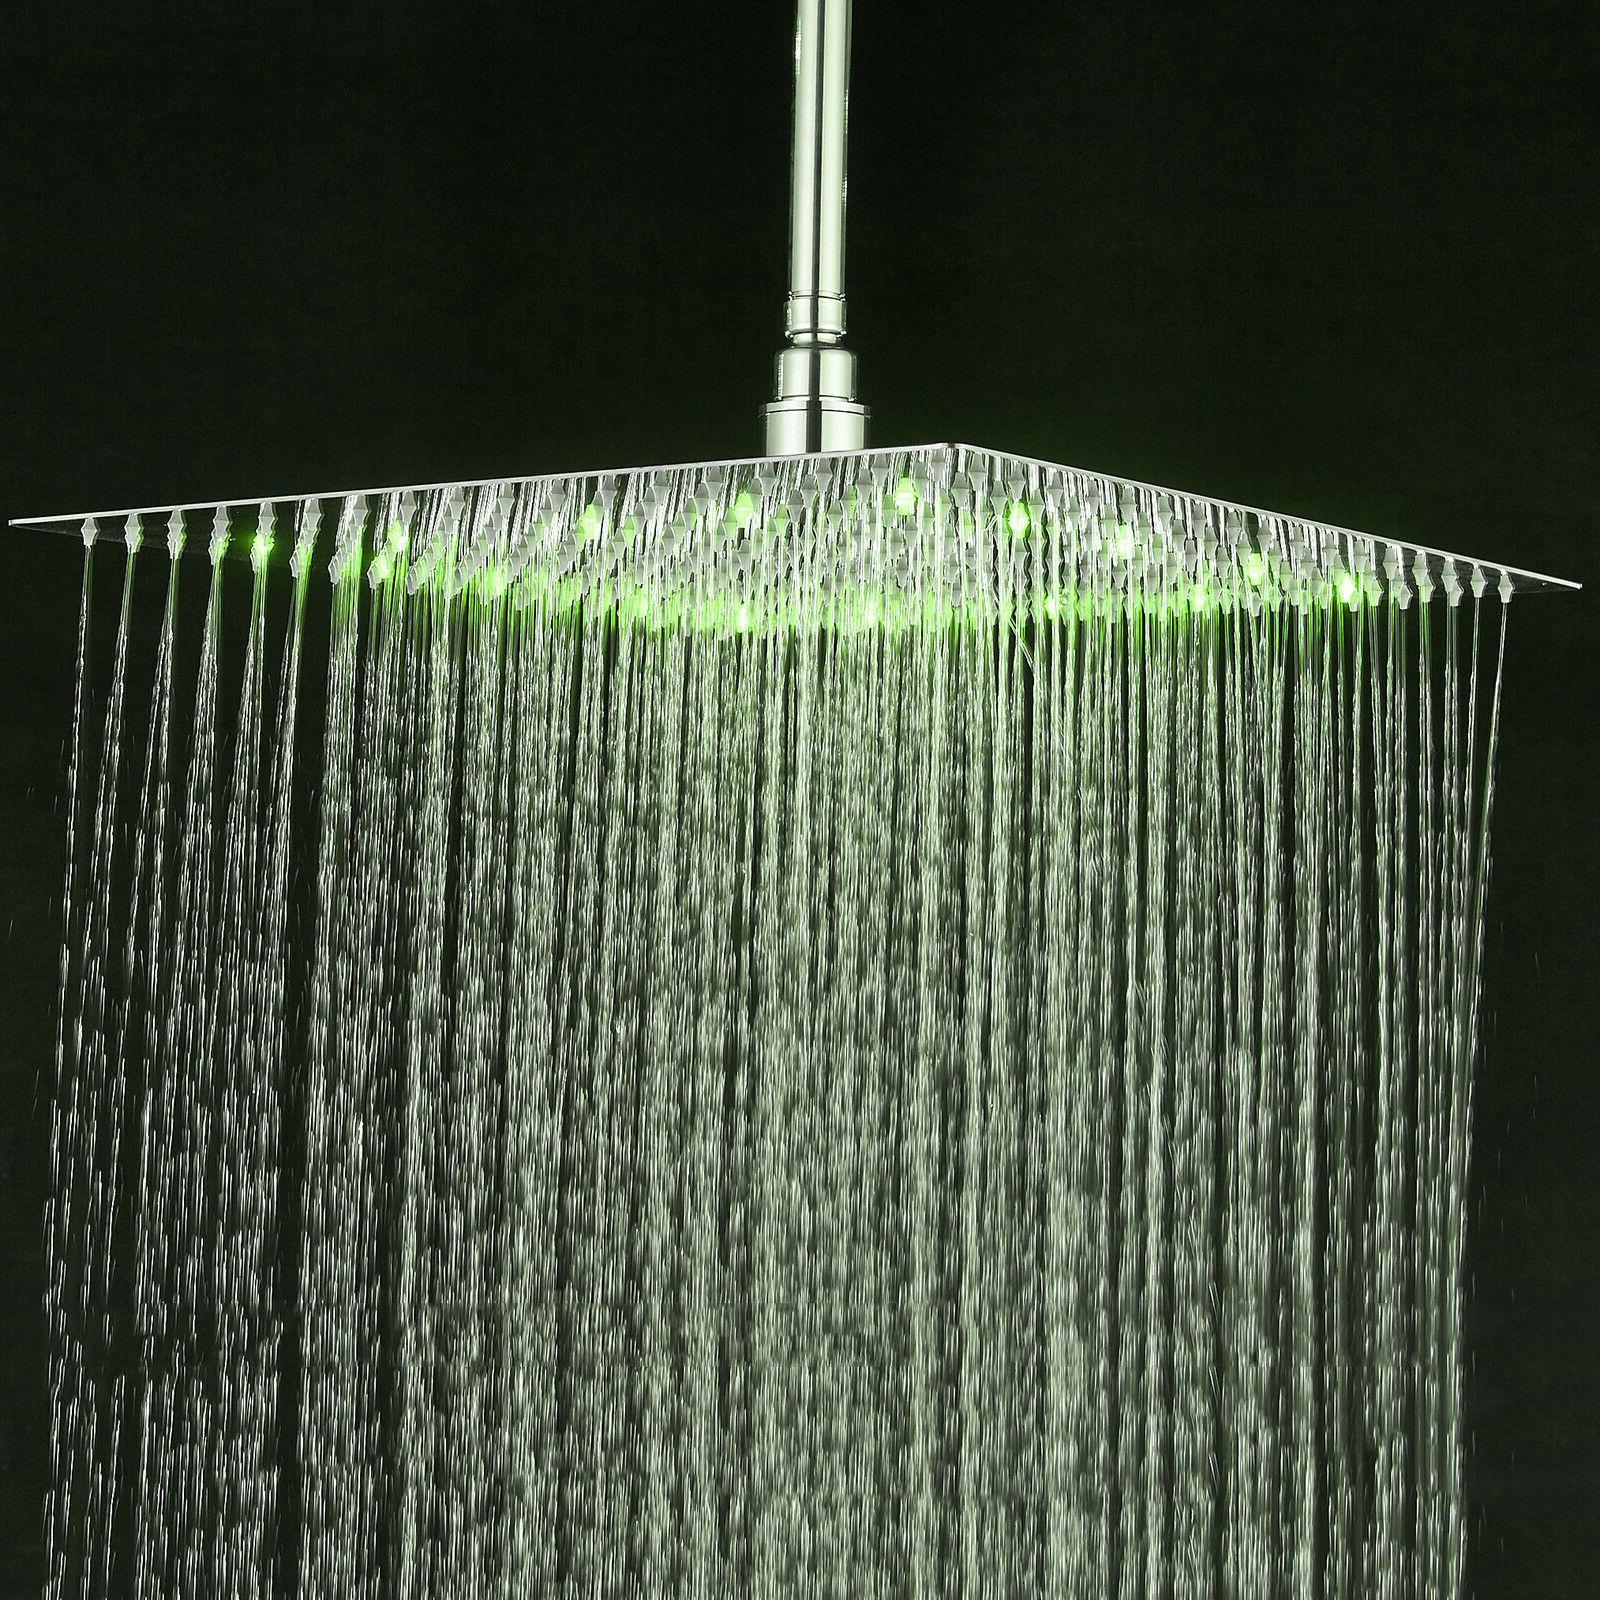 Rozin Ultra Chrome 304 Stainless Inch Shower Head